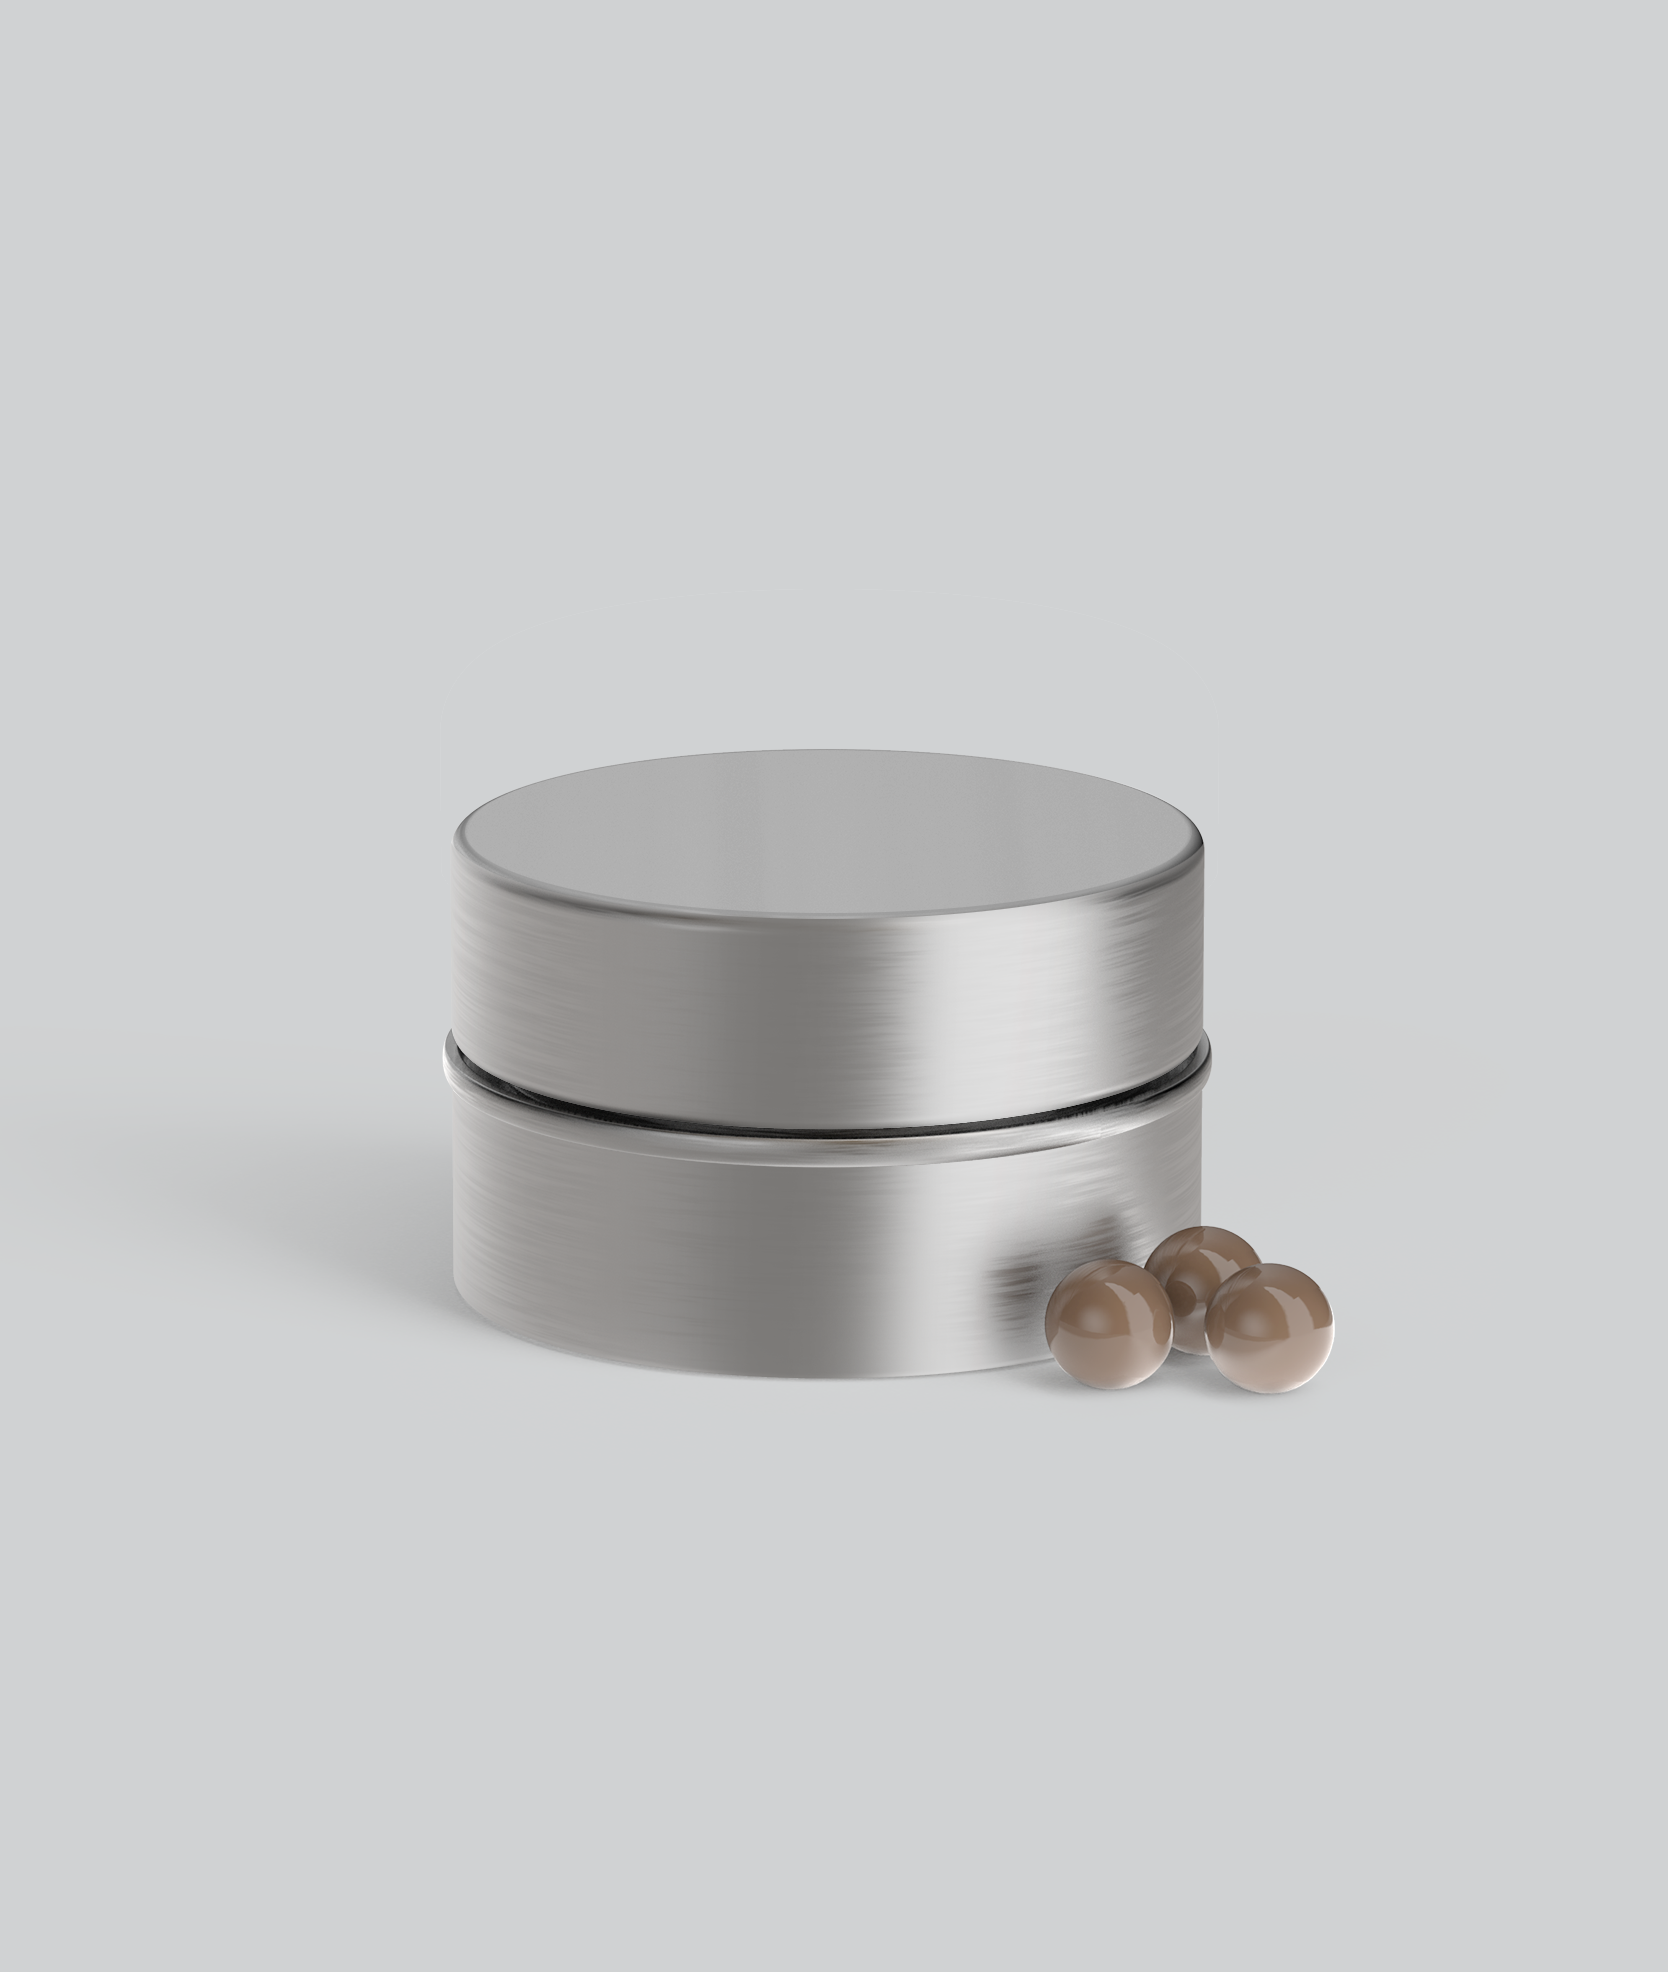 round-tin-marijuana-edible-packaging